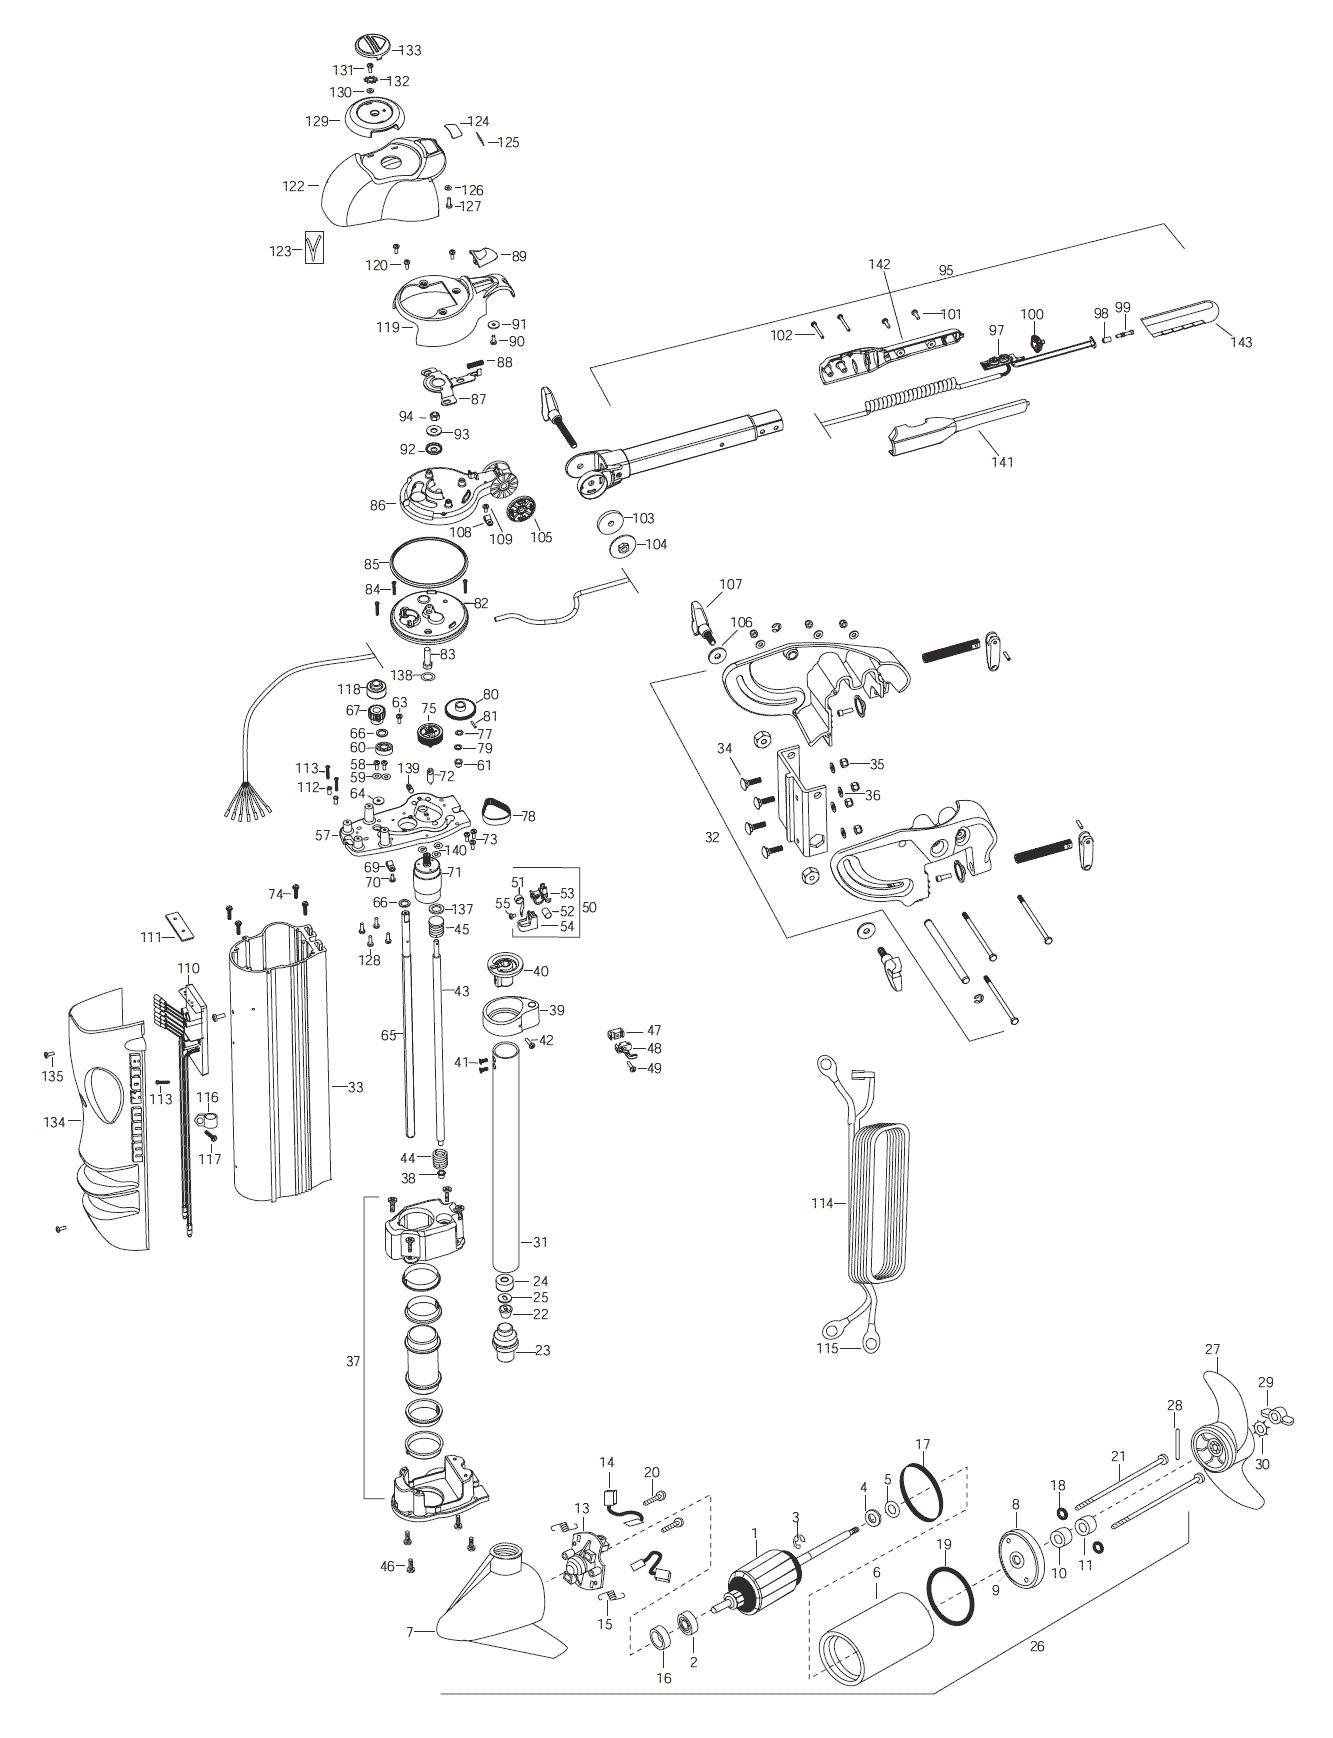 Minn Kota 24 Volt Wiring Diagram Diagram – Trolling Motor Wiring Diagram